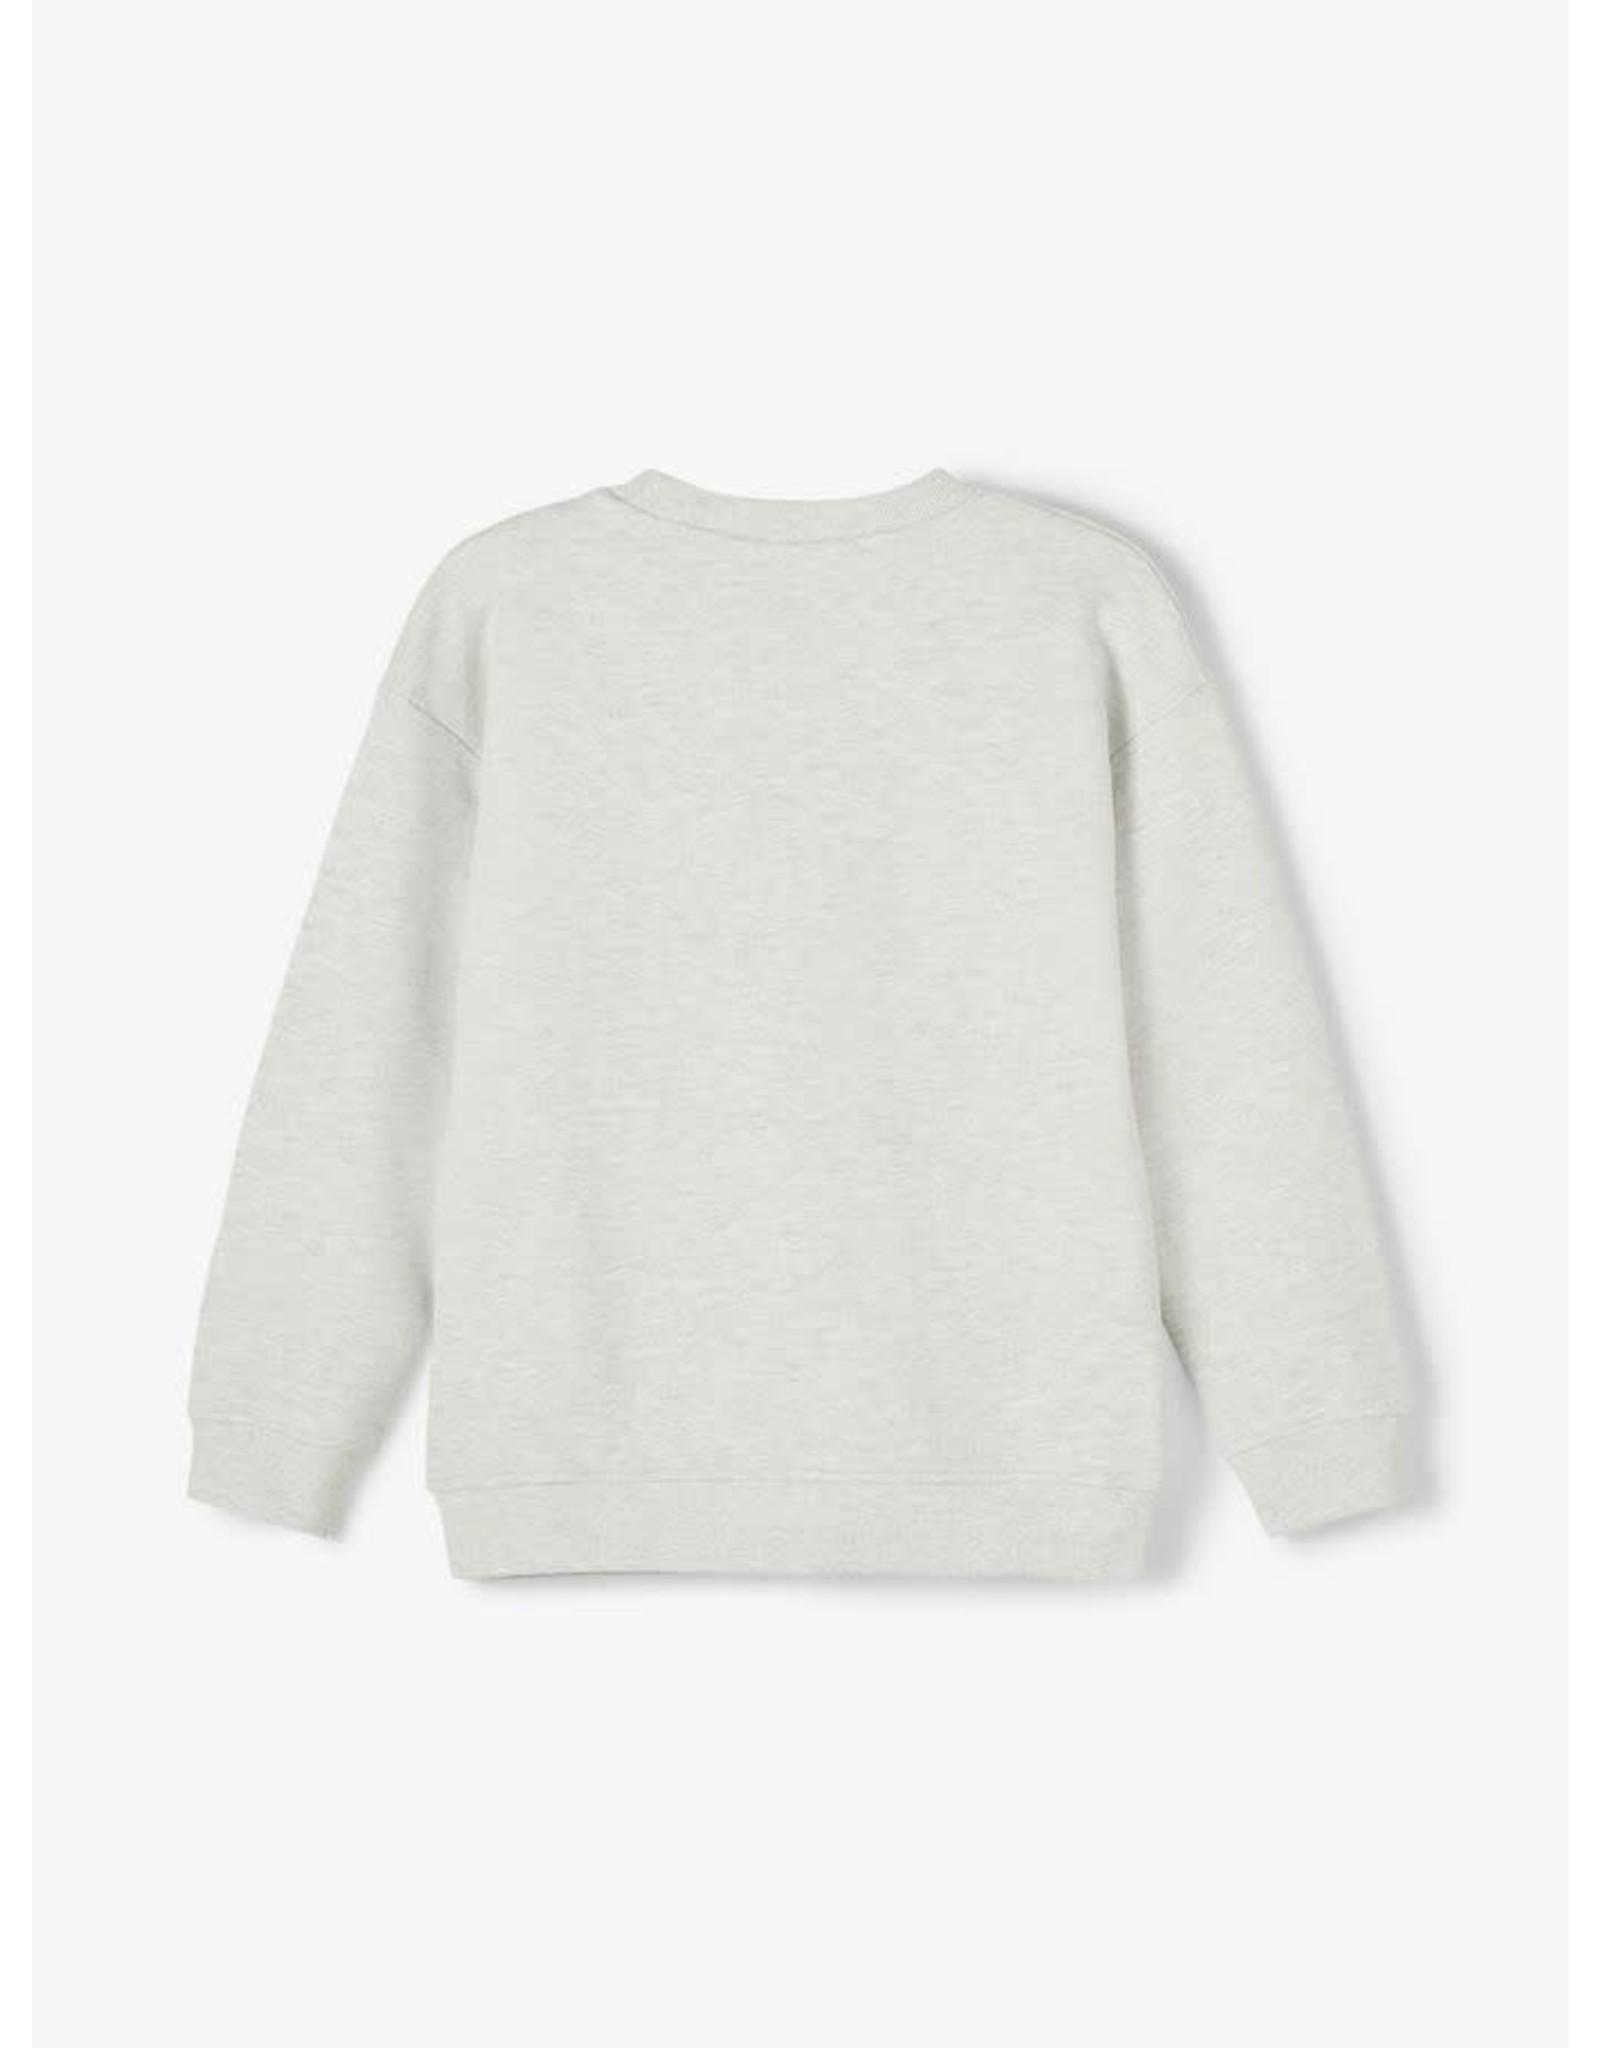 Name It Grijze katoenen sweatstof trui